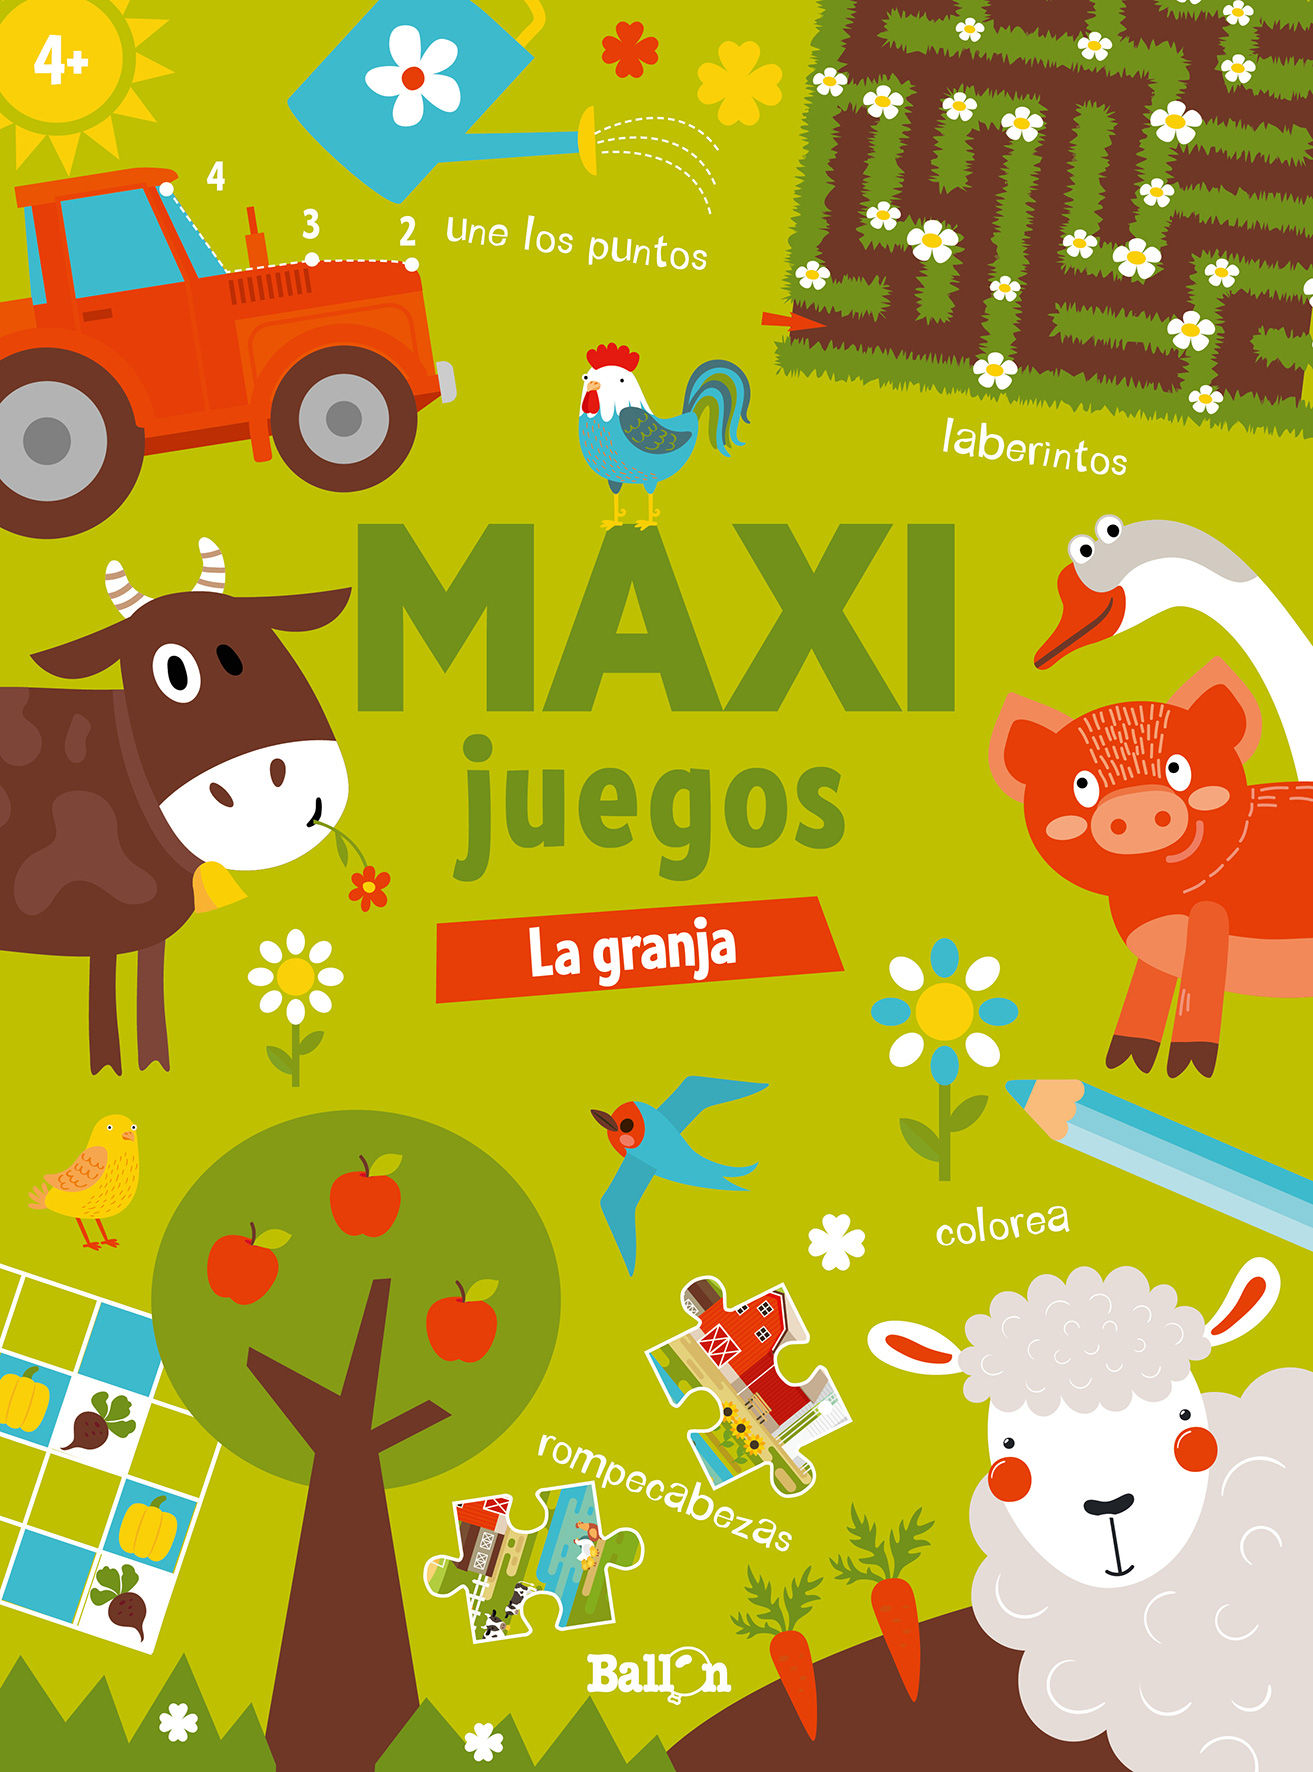 MAXI JUEGOS LA GRANJA